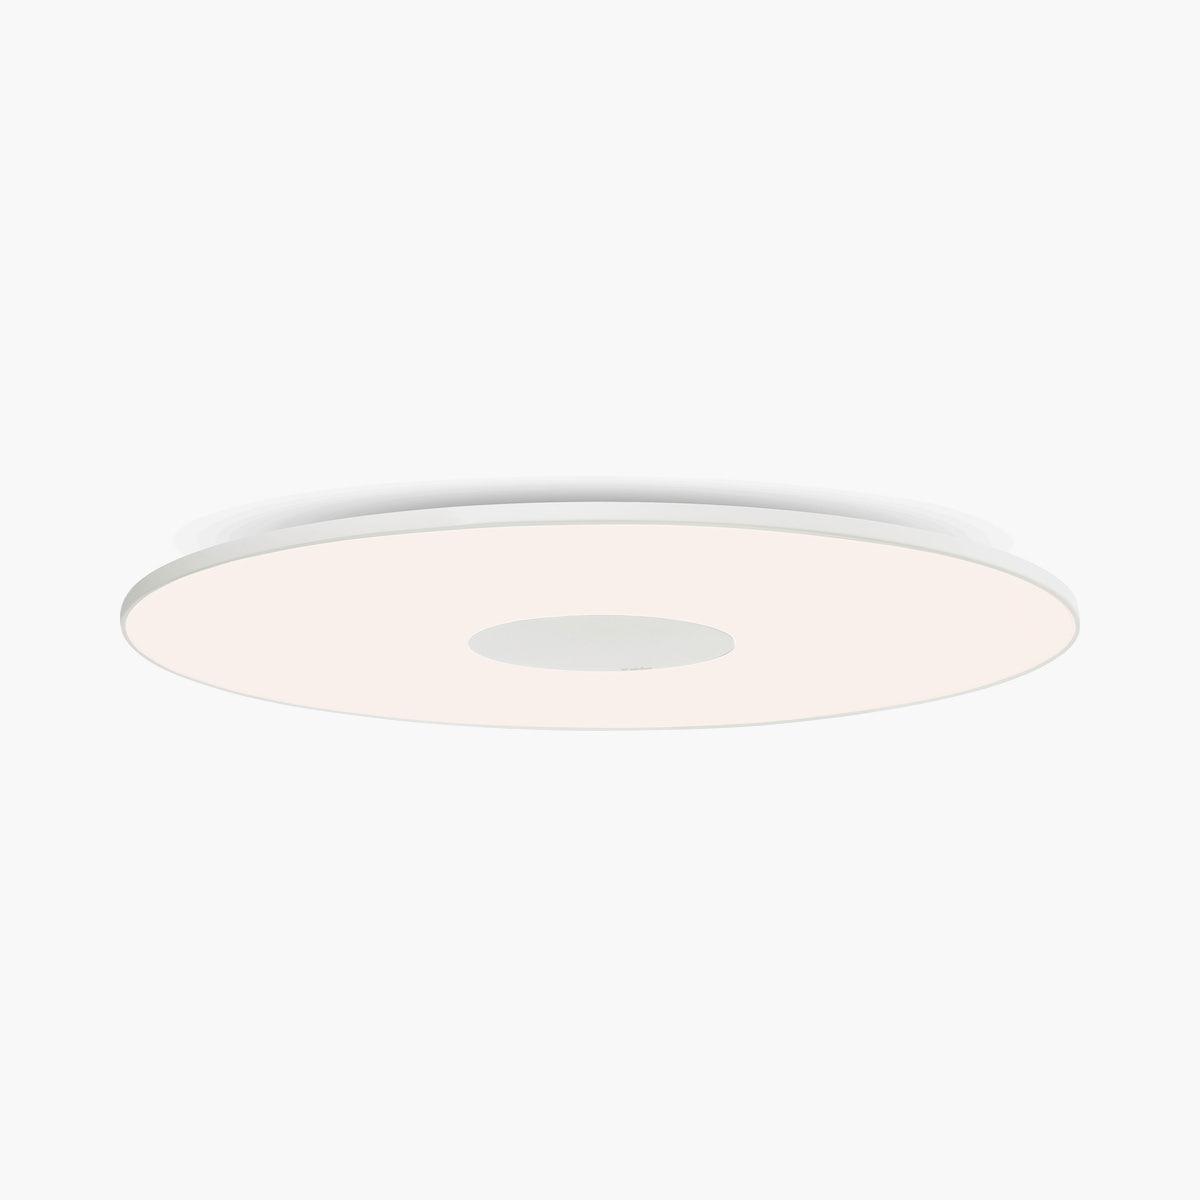 Circa LED Ceiling Lamp